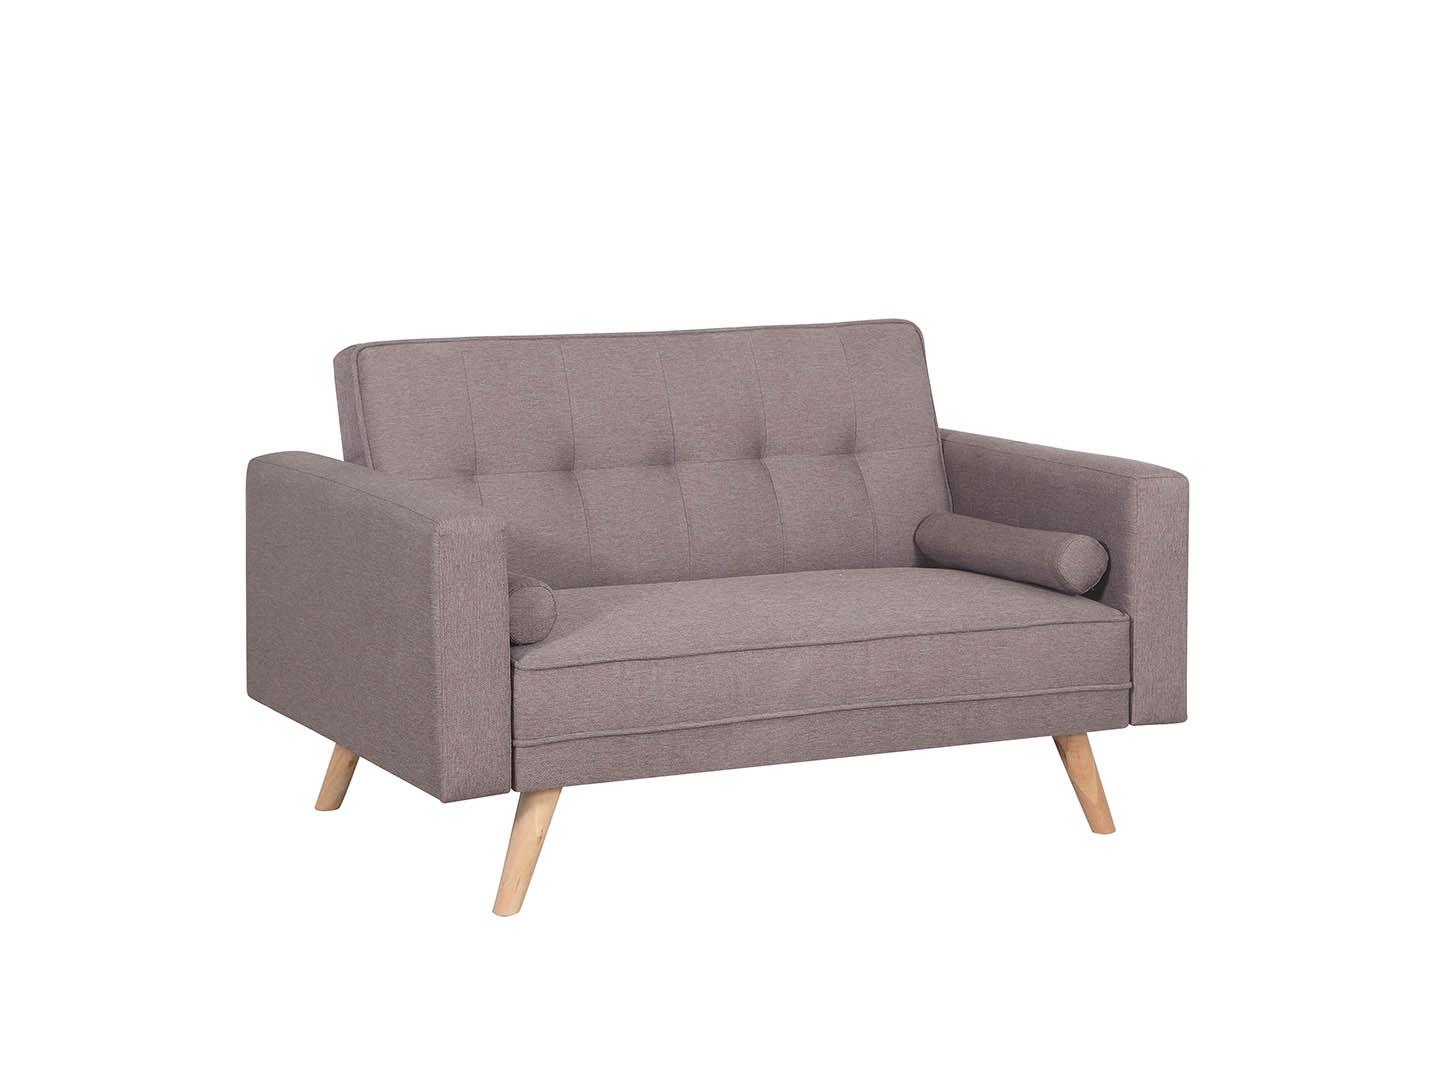 ethan-medium-sofa-bed